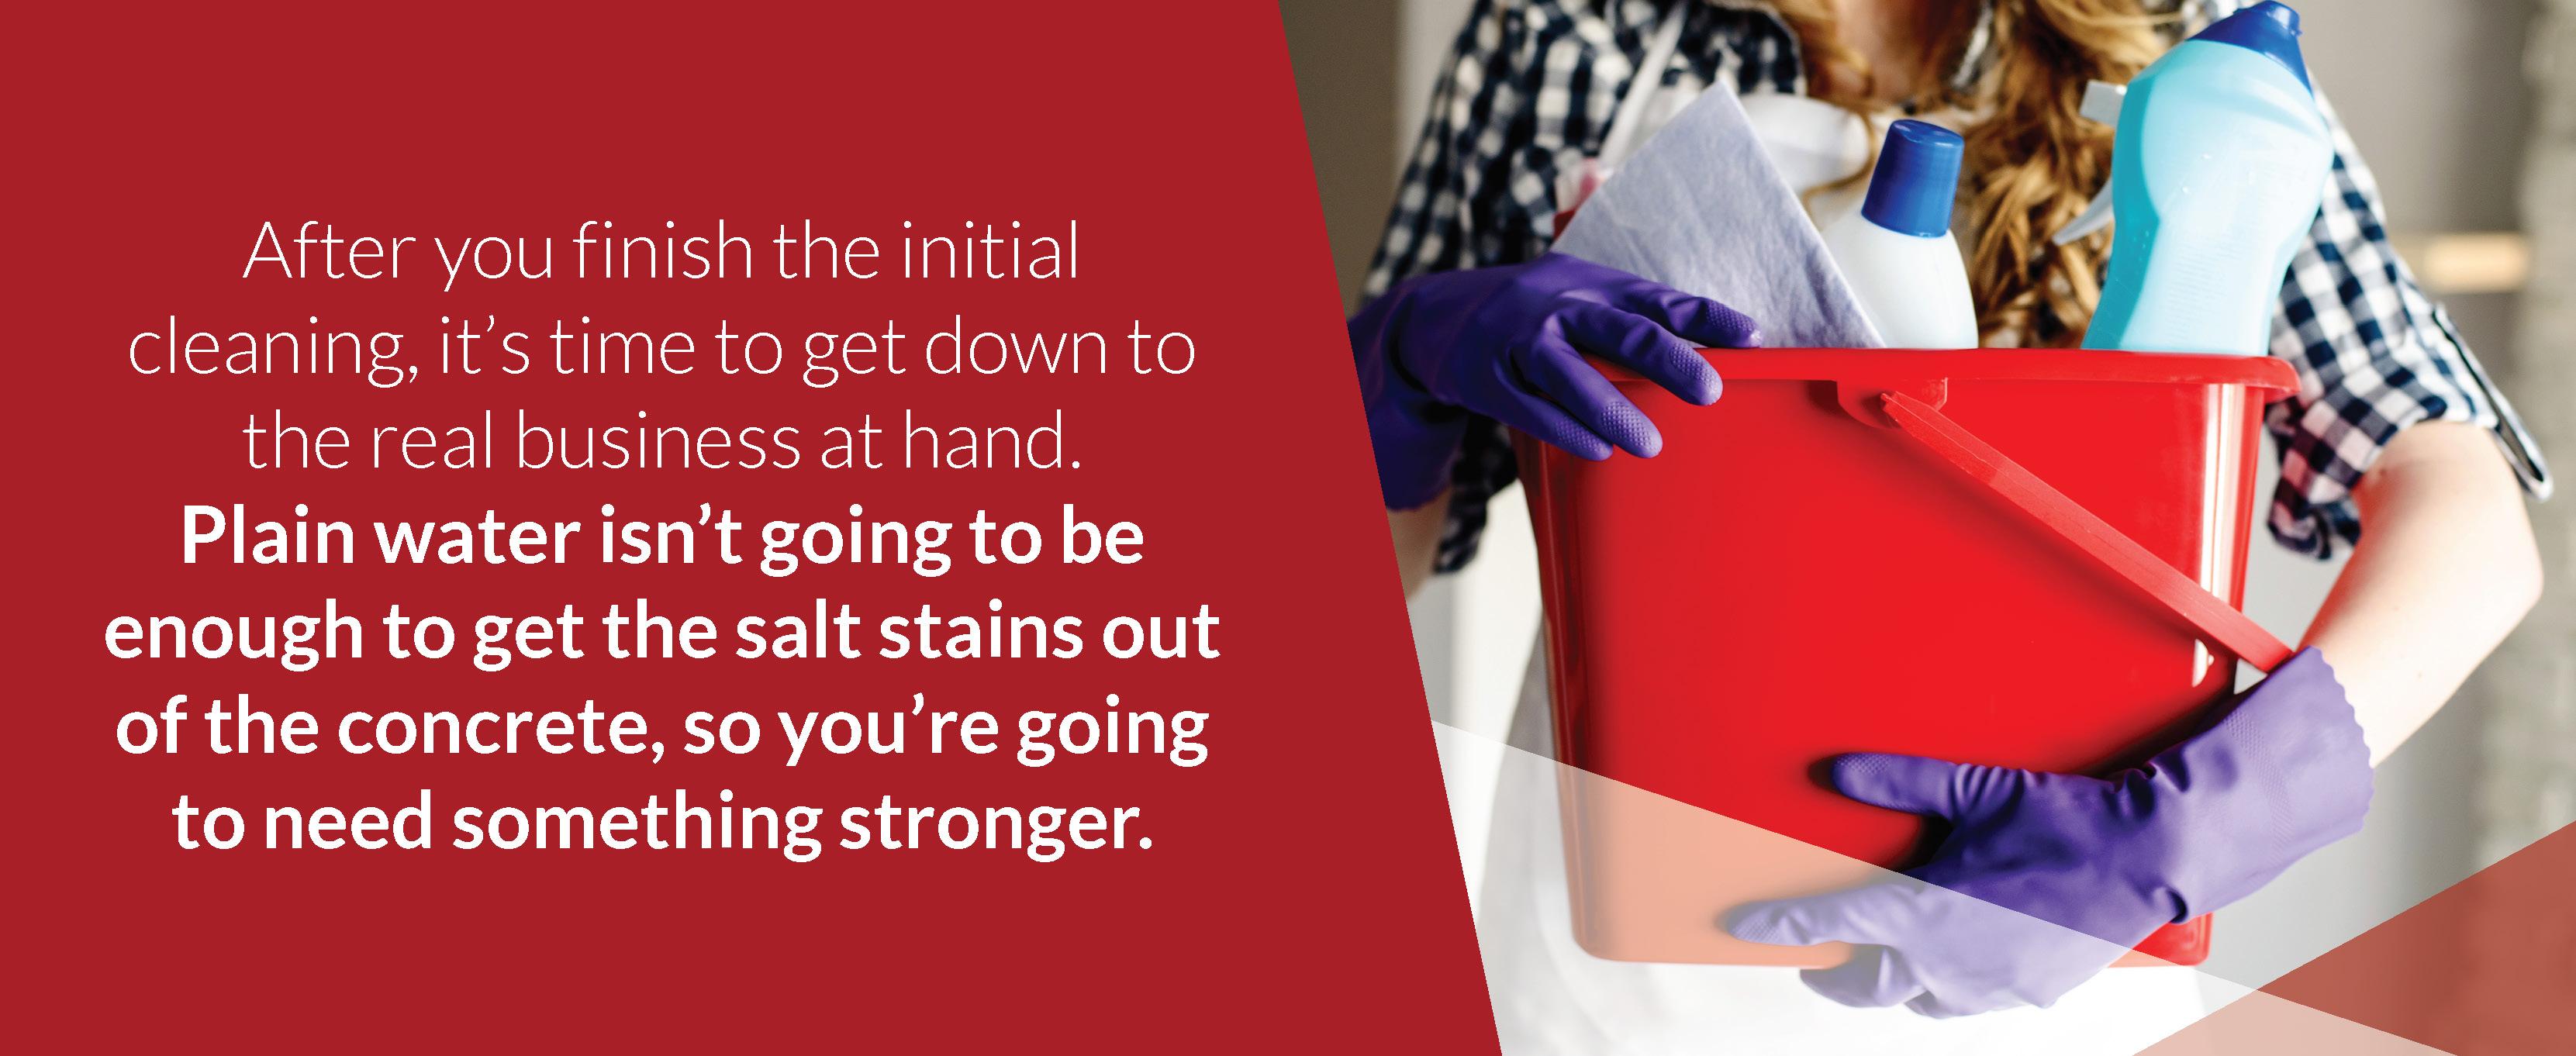 salt-stains